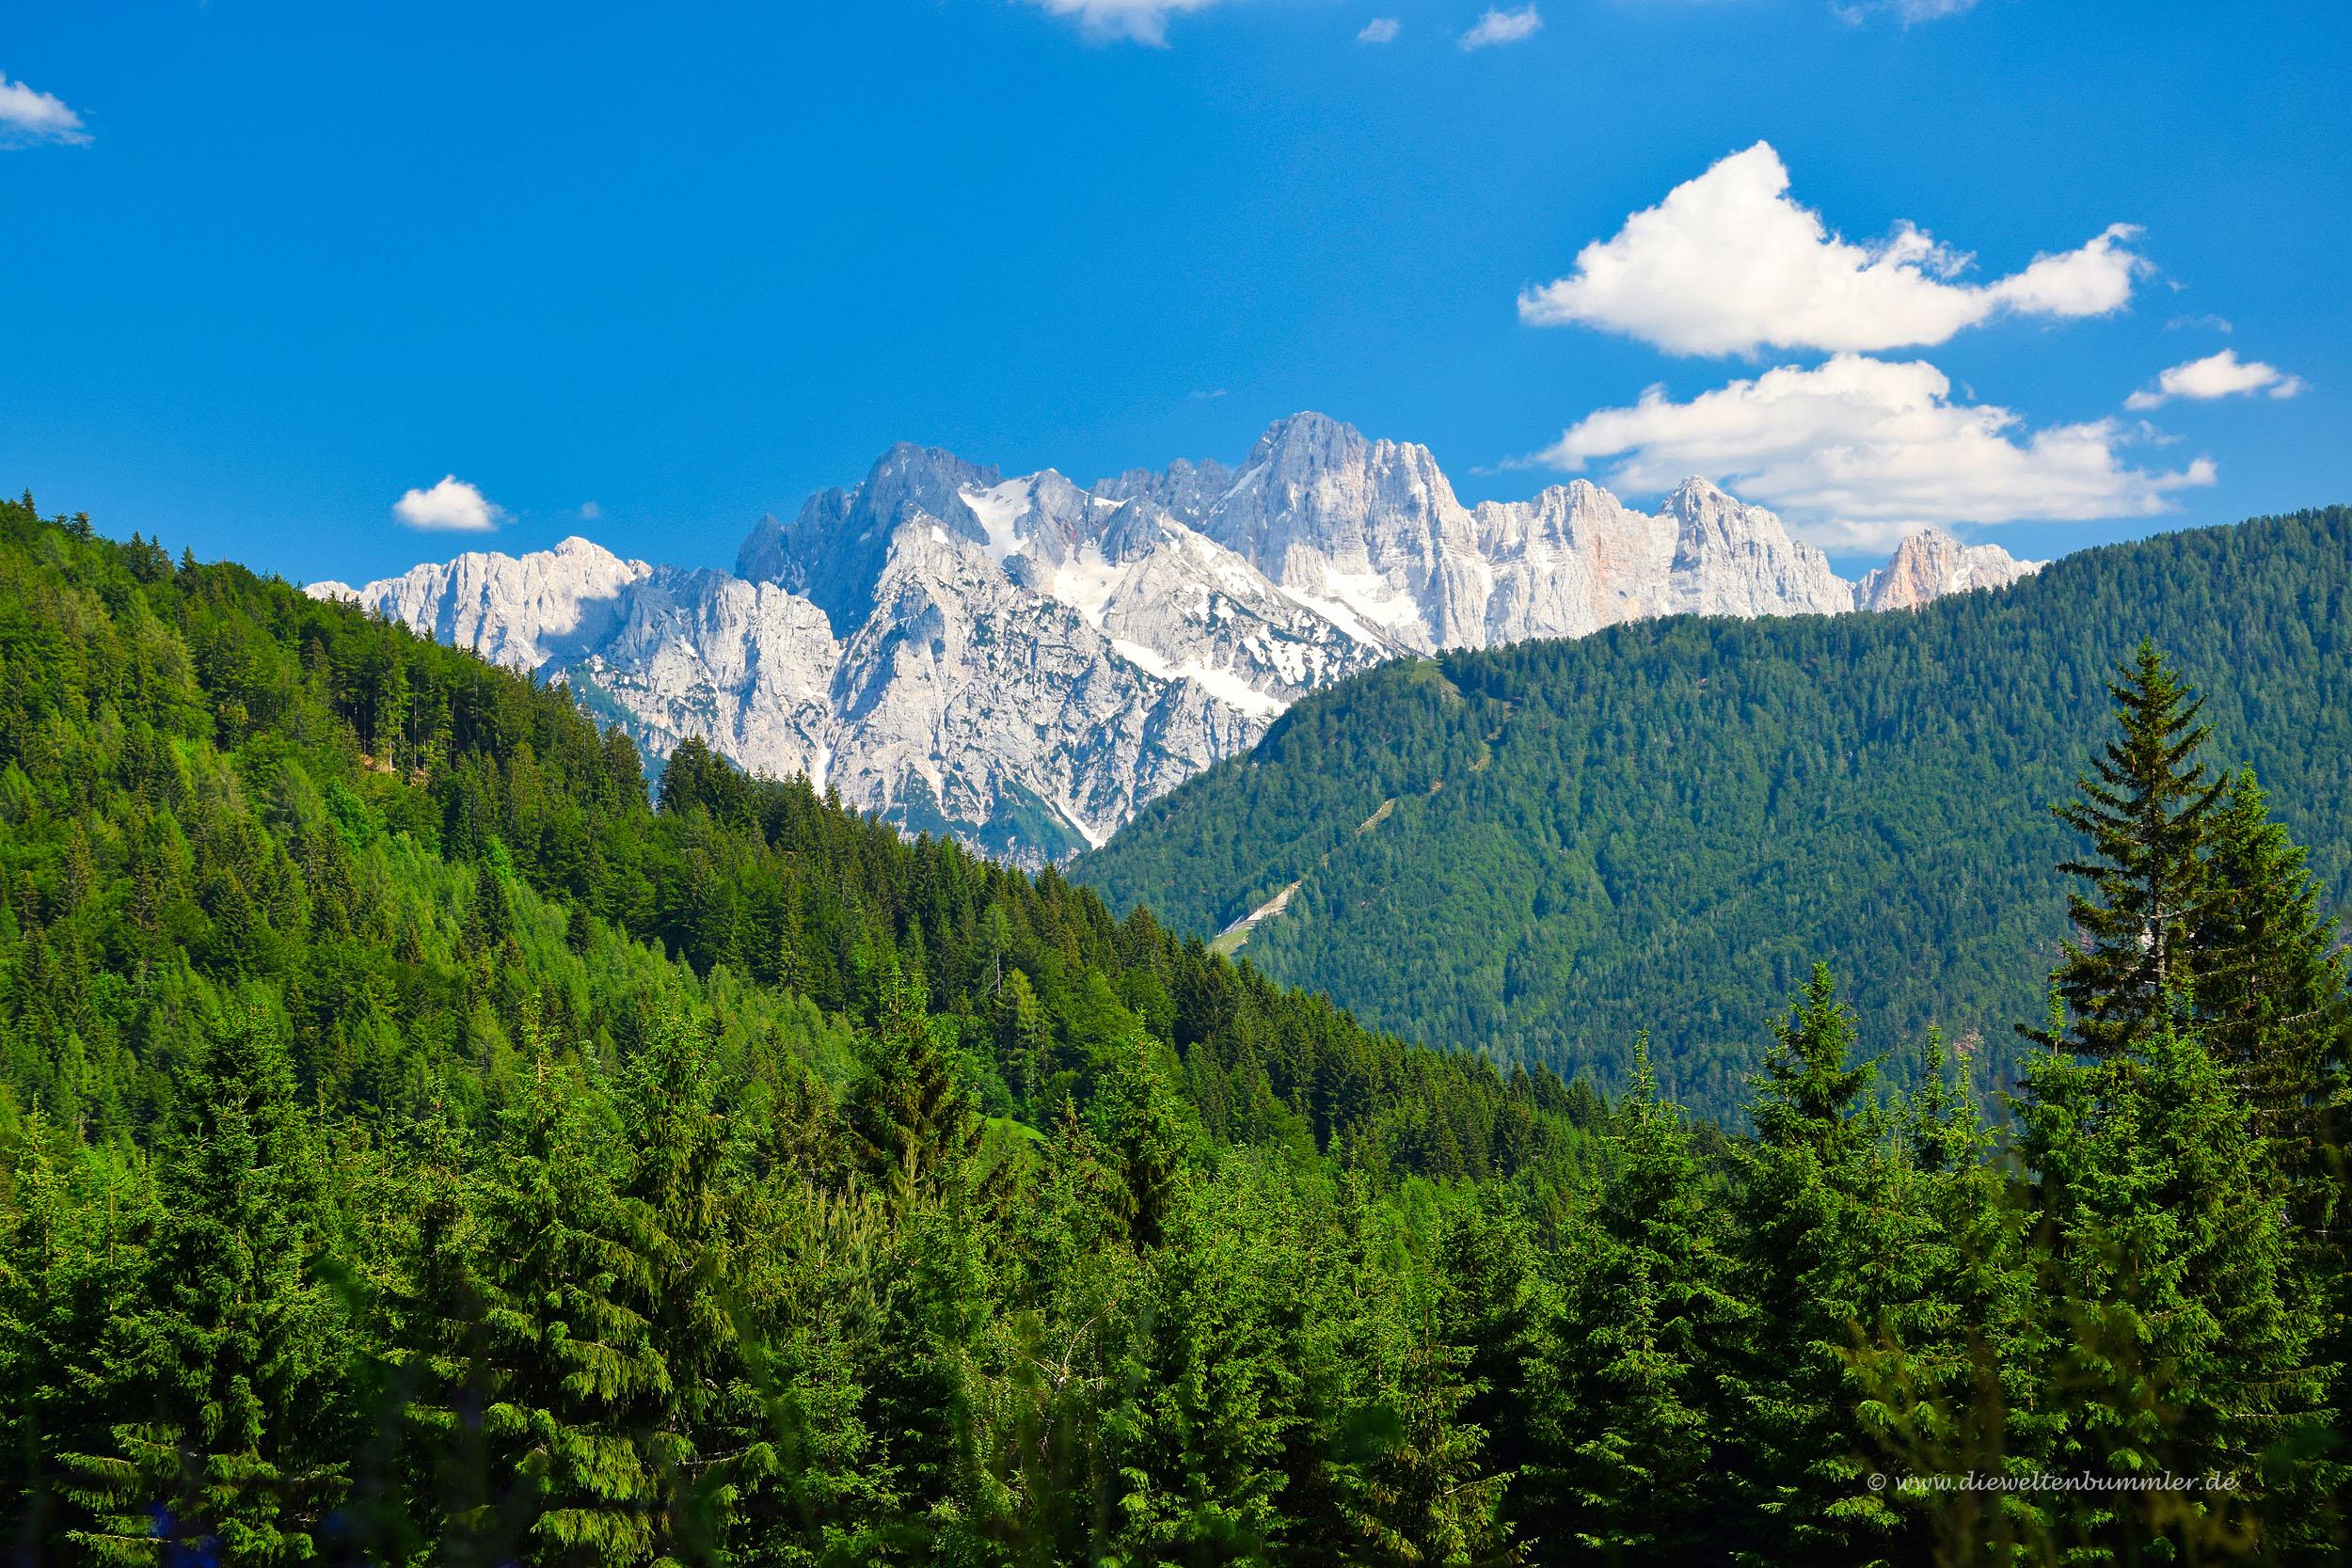 Ausblick zum Triglav-Gebirge